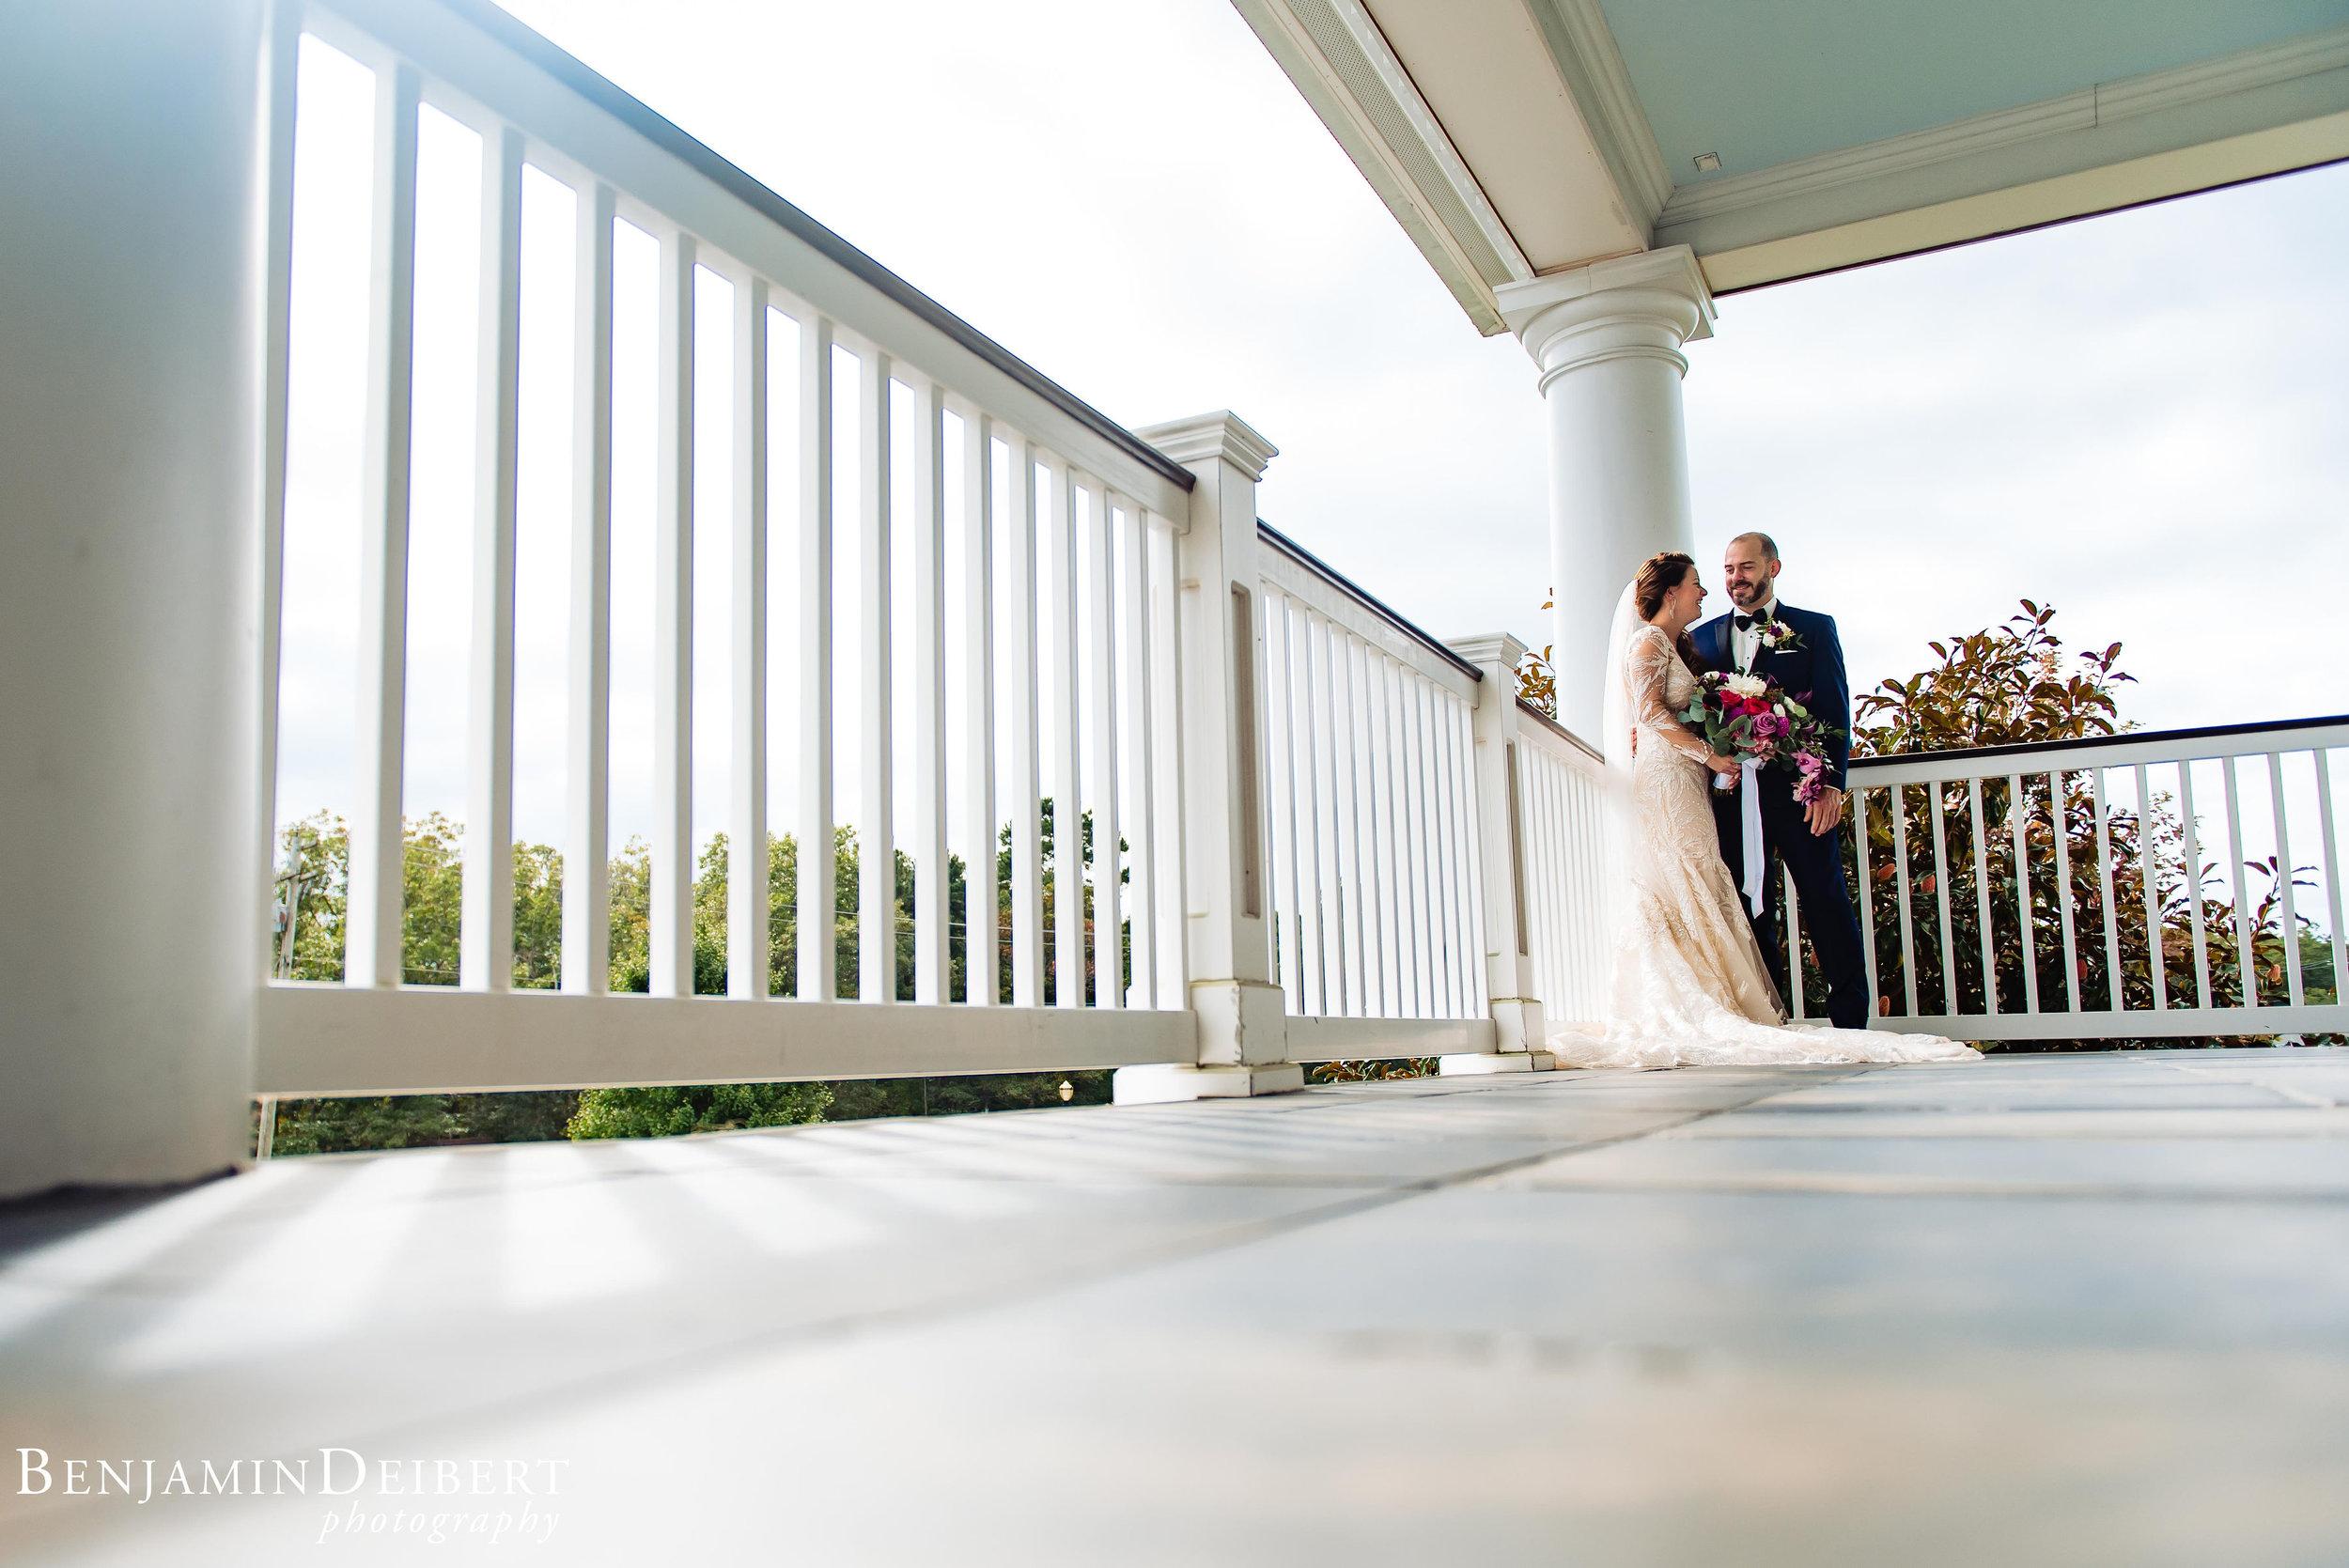 AmandaandElliott_TheCarriageHouse_Wedding-24.jpg